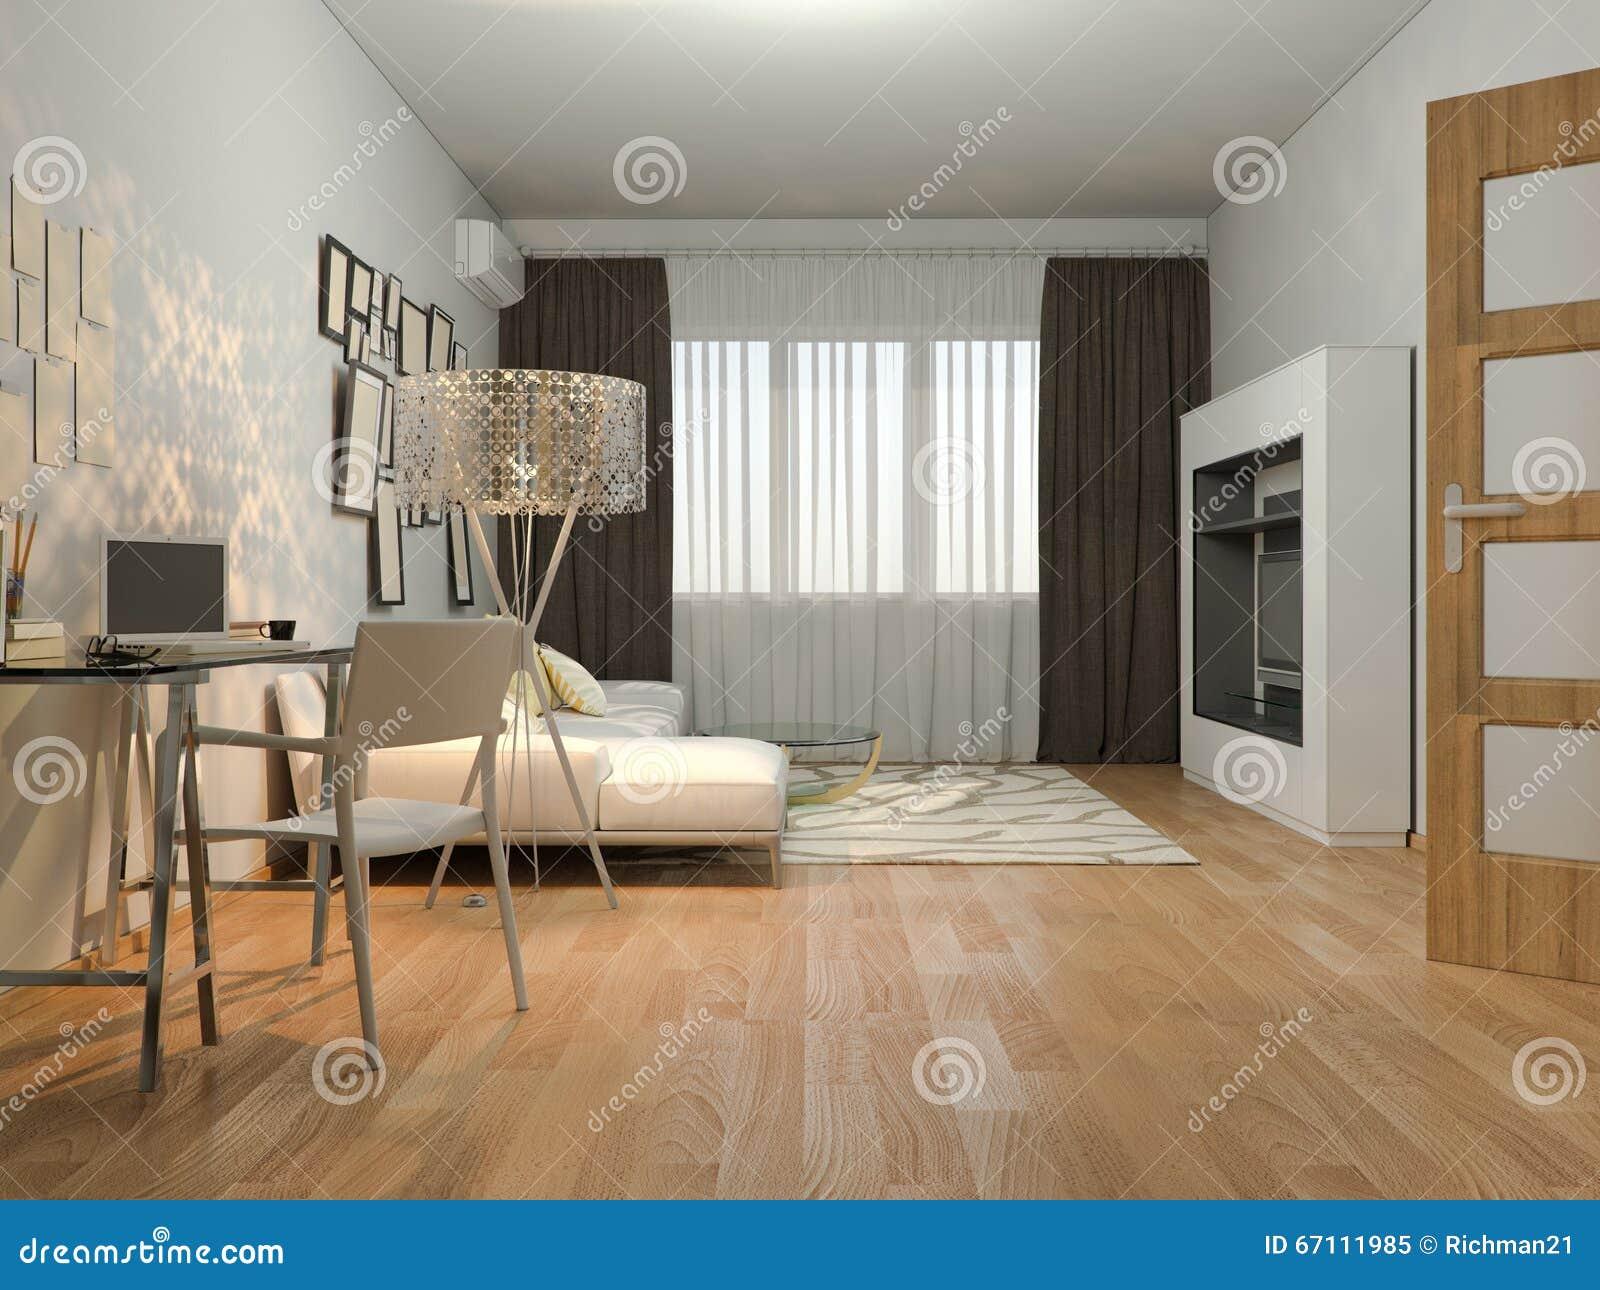 Living In A Studio Apartment 3d visualization of interior design living in a studio apartment